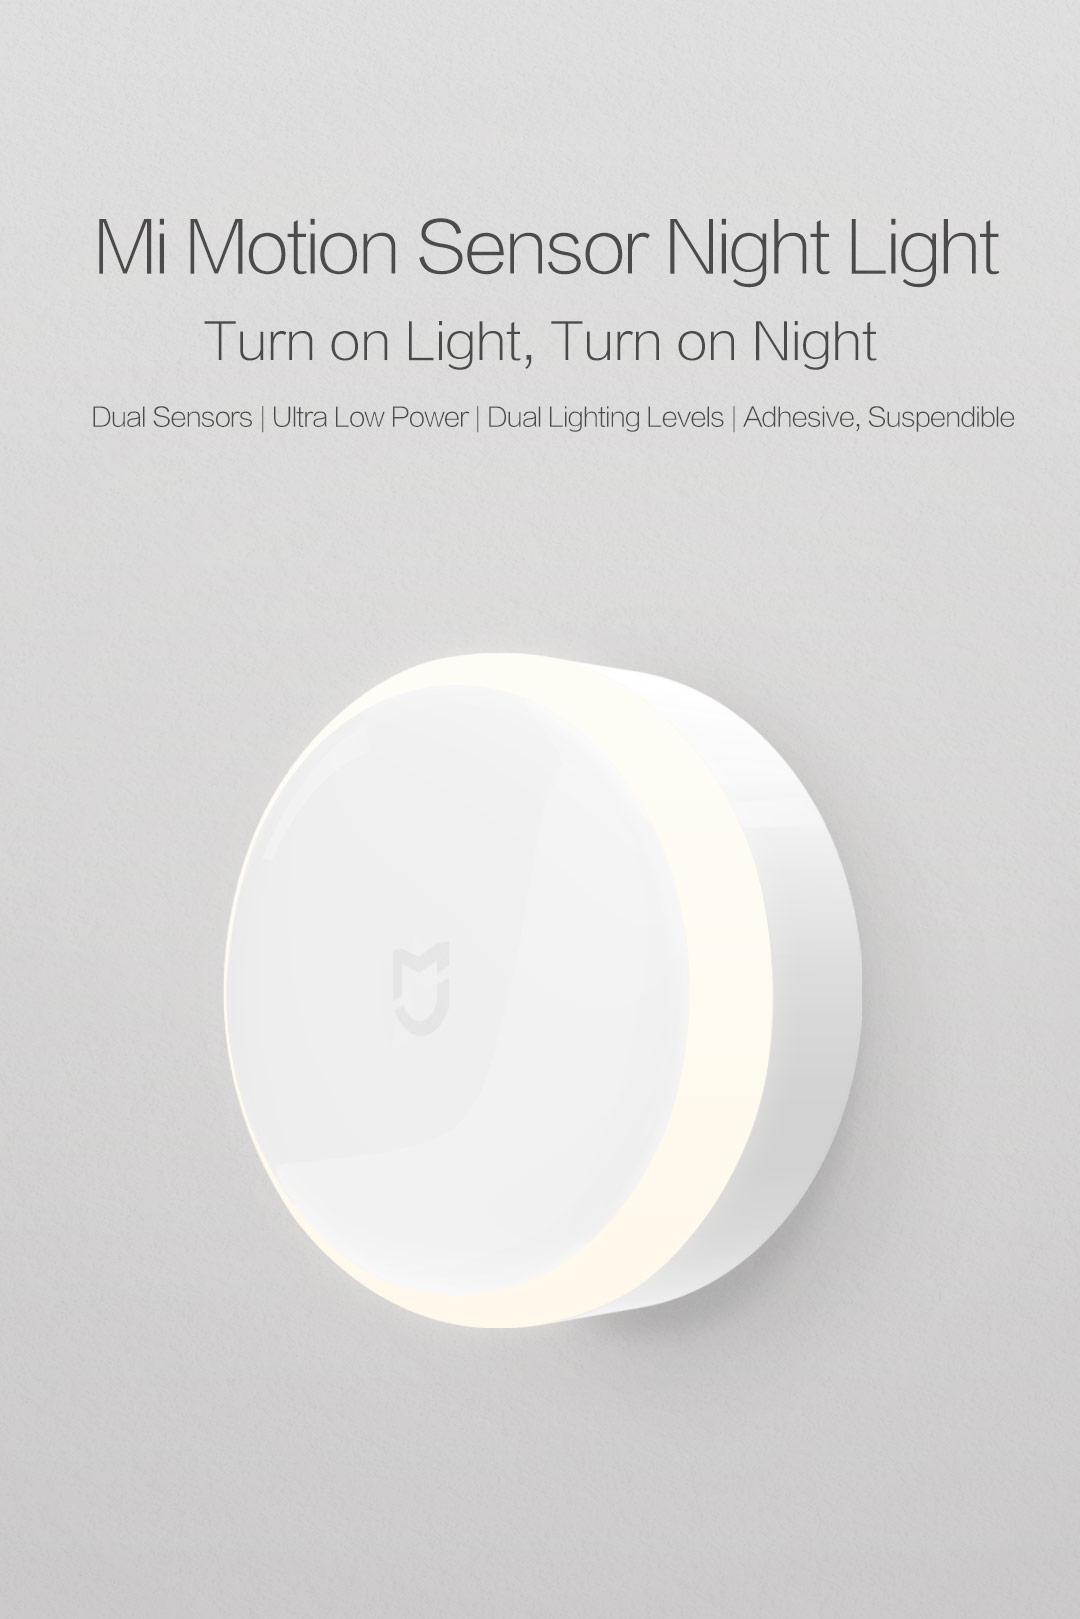 brand new f820c 87c35 Yeelight Smart Motion Sensor IR LED Nightlight (3x AA Battery Included) -  Xiaomi Mi Night Light - Plug and Play - Built in Infra Red Body Motion ...